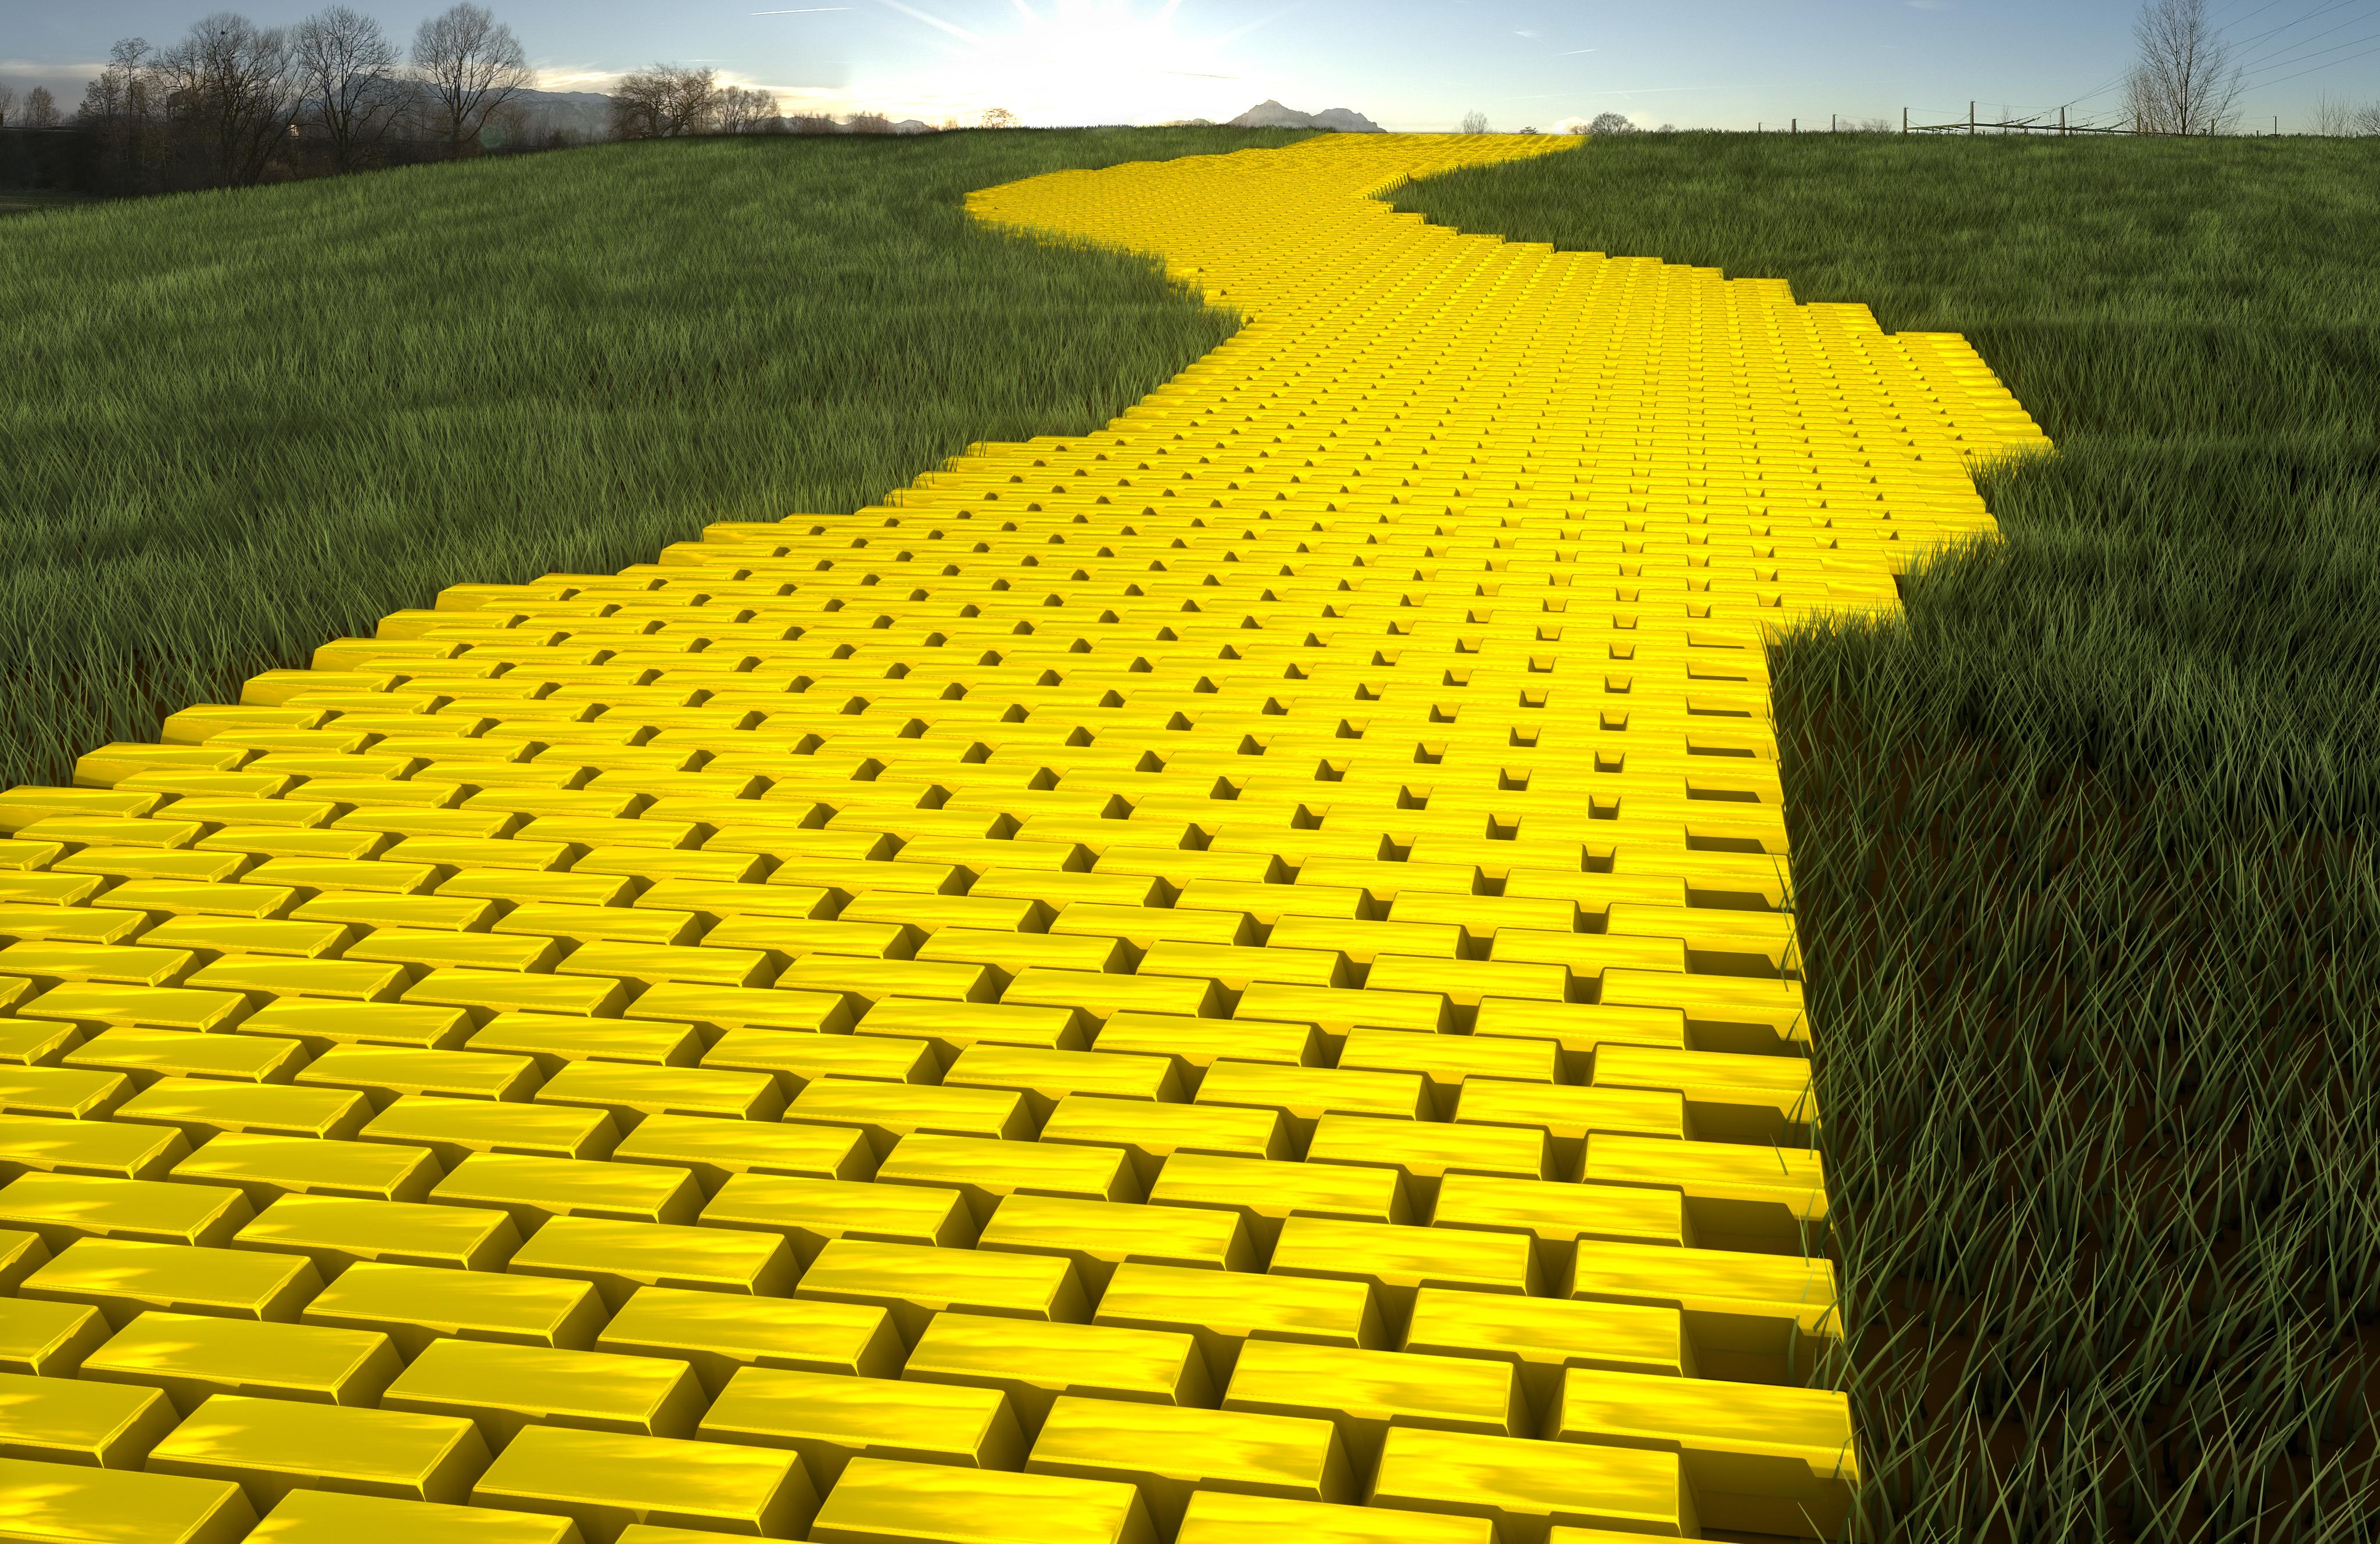 Yellow brick road clipart-Yellow brick road clipart-16